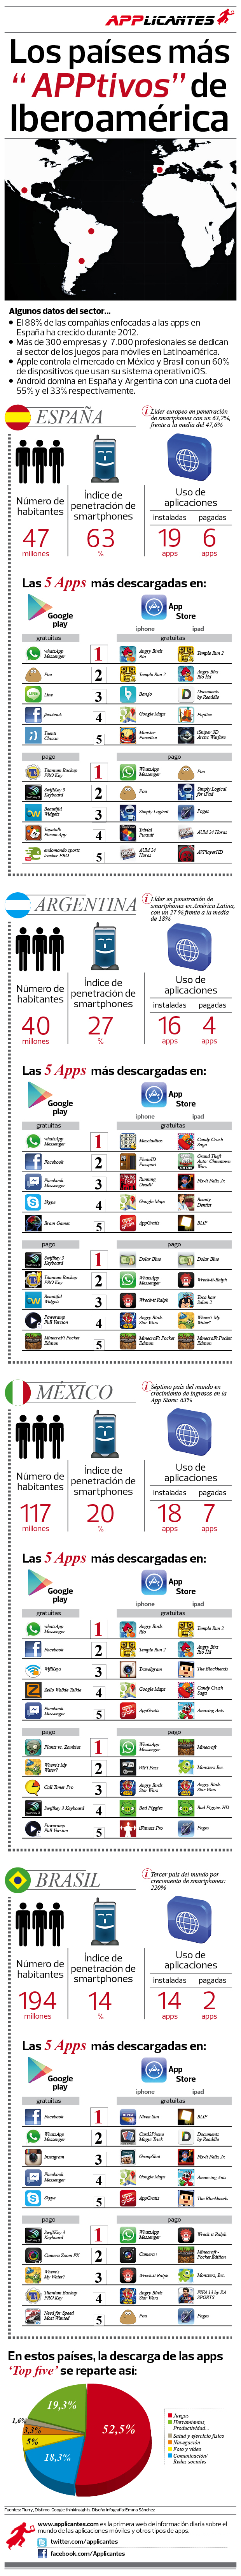 infografia applicantes.com los países más apptivos de Iberoamérica